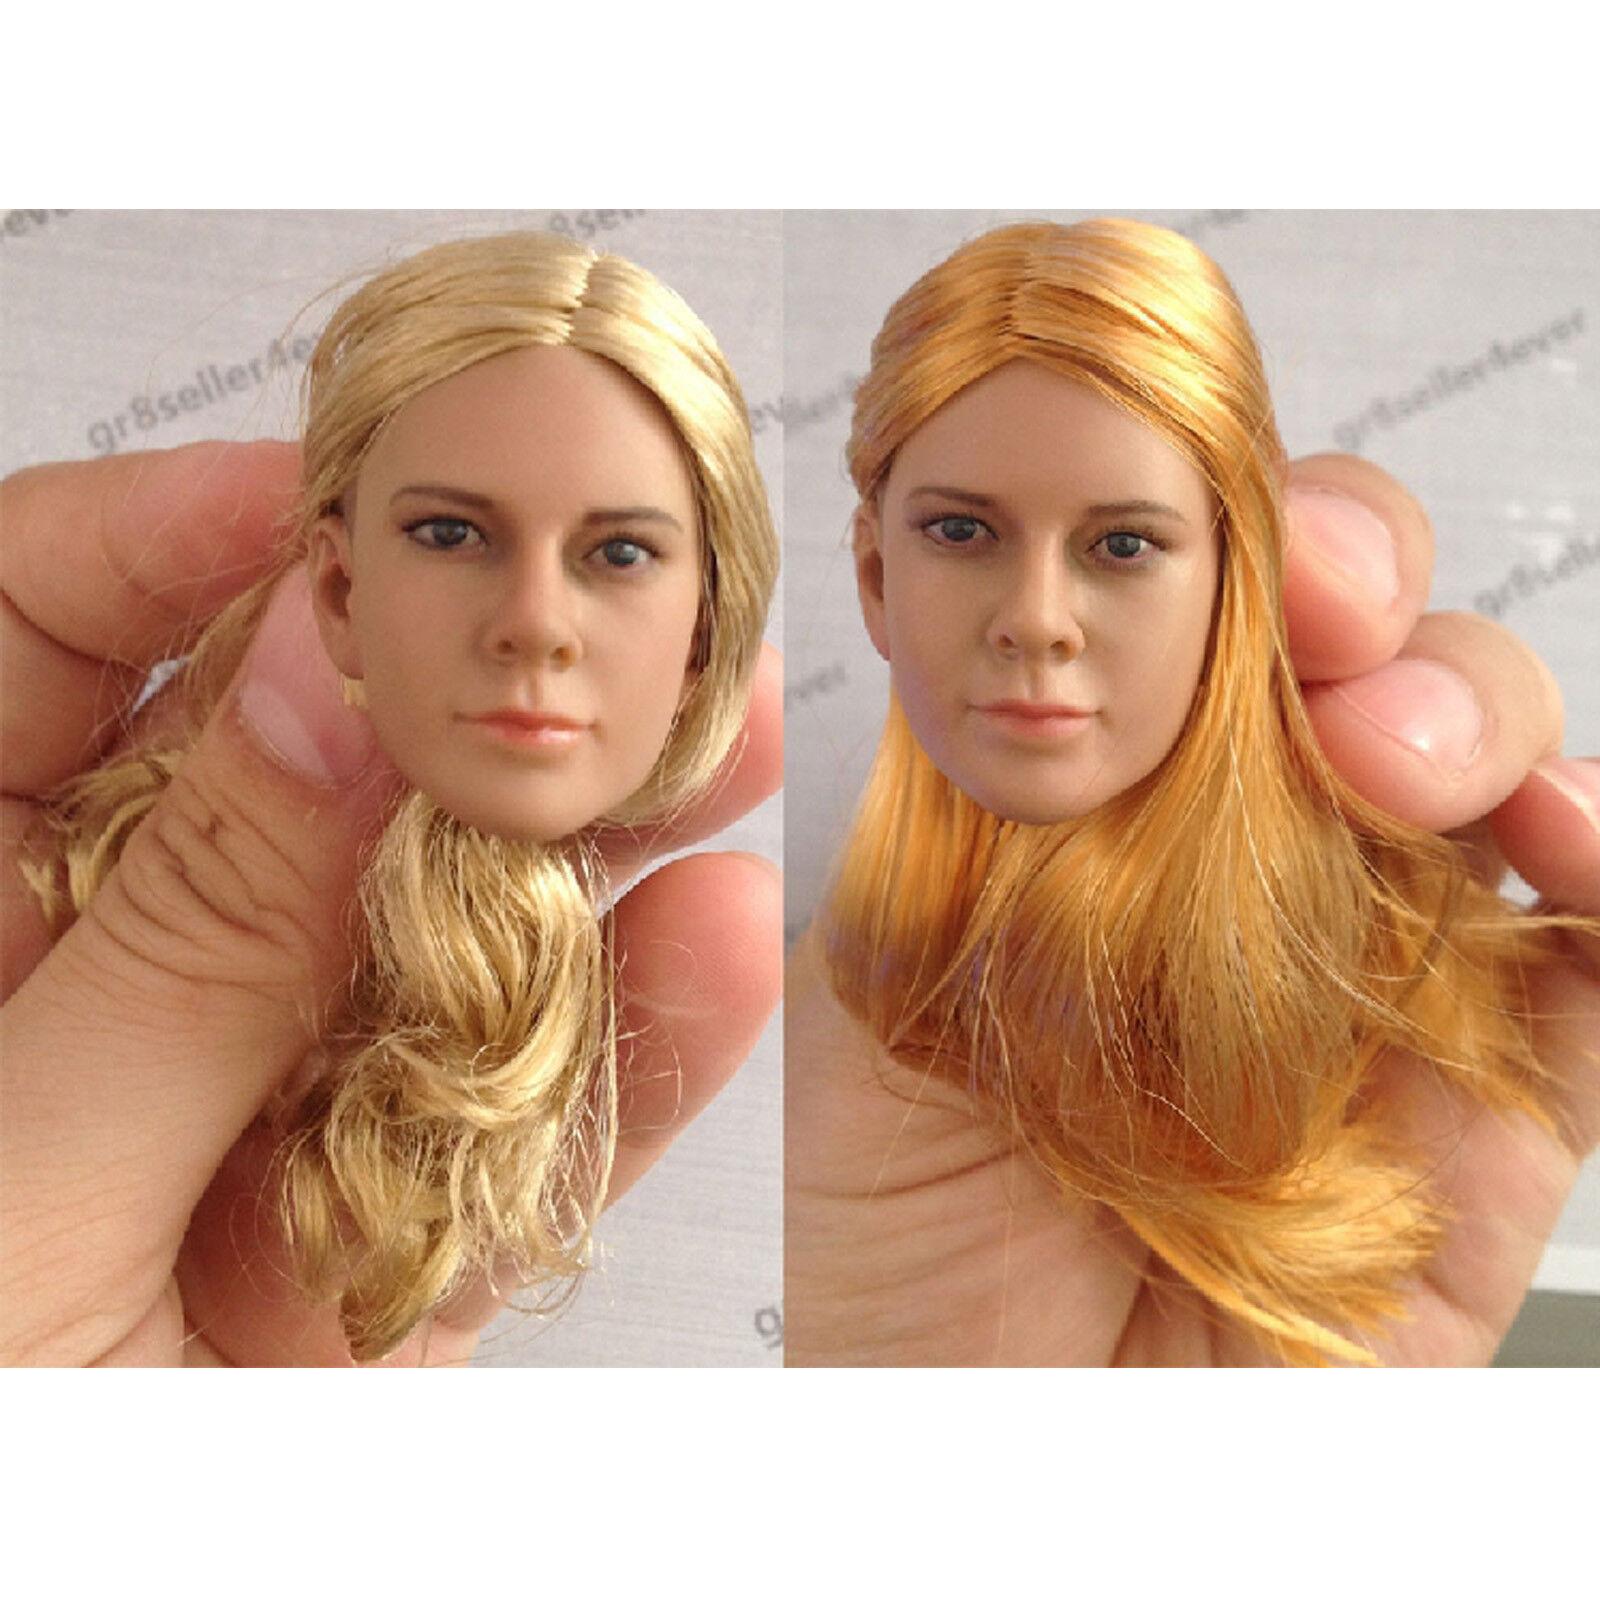 Toys D003A B 1 6 Scale Female head Sculpt  For 12  Hot Toys Phicen Action Figure  mode